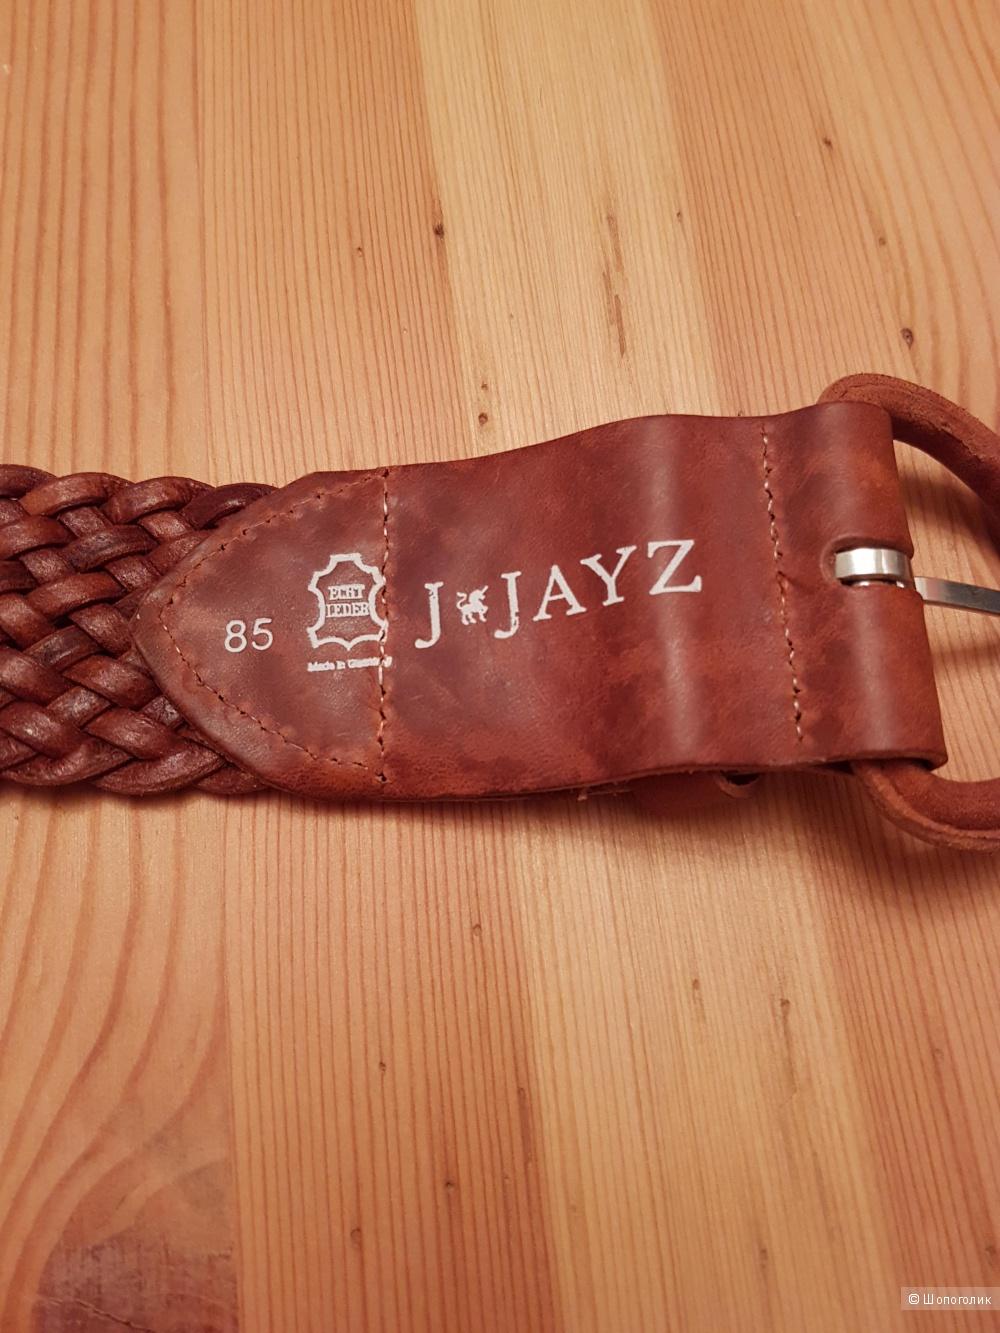 Ремень J*JAYZ, размер 85 см.